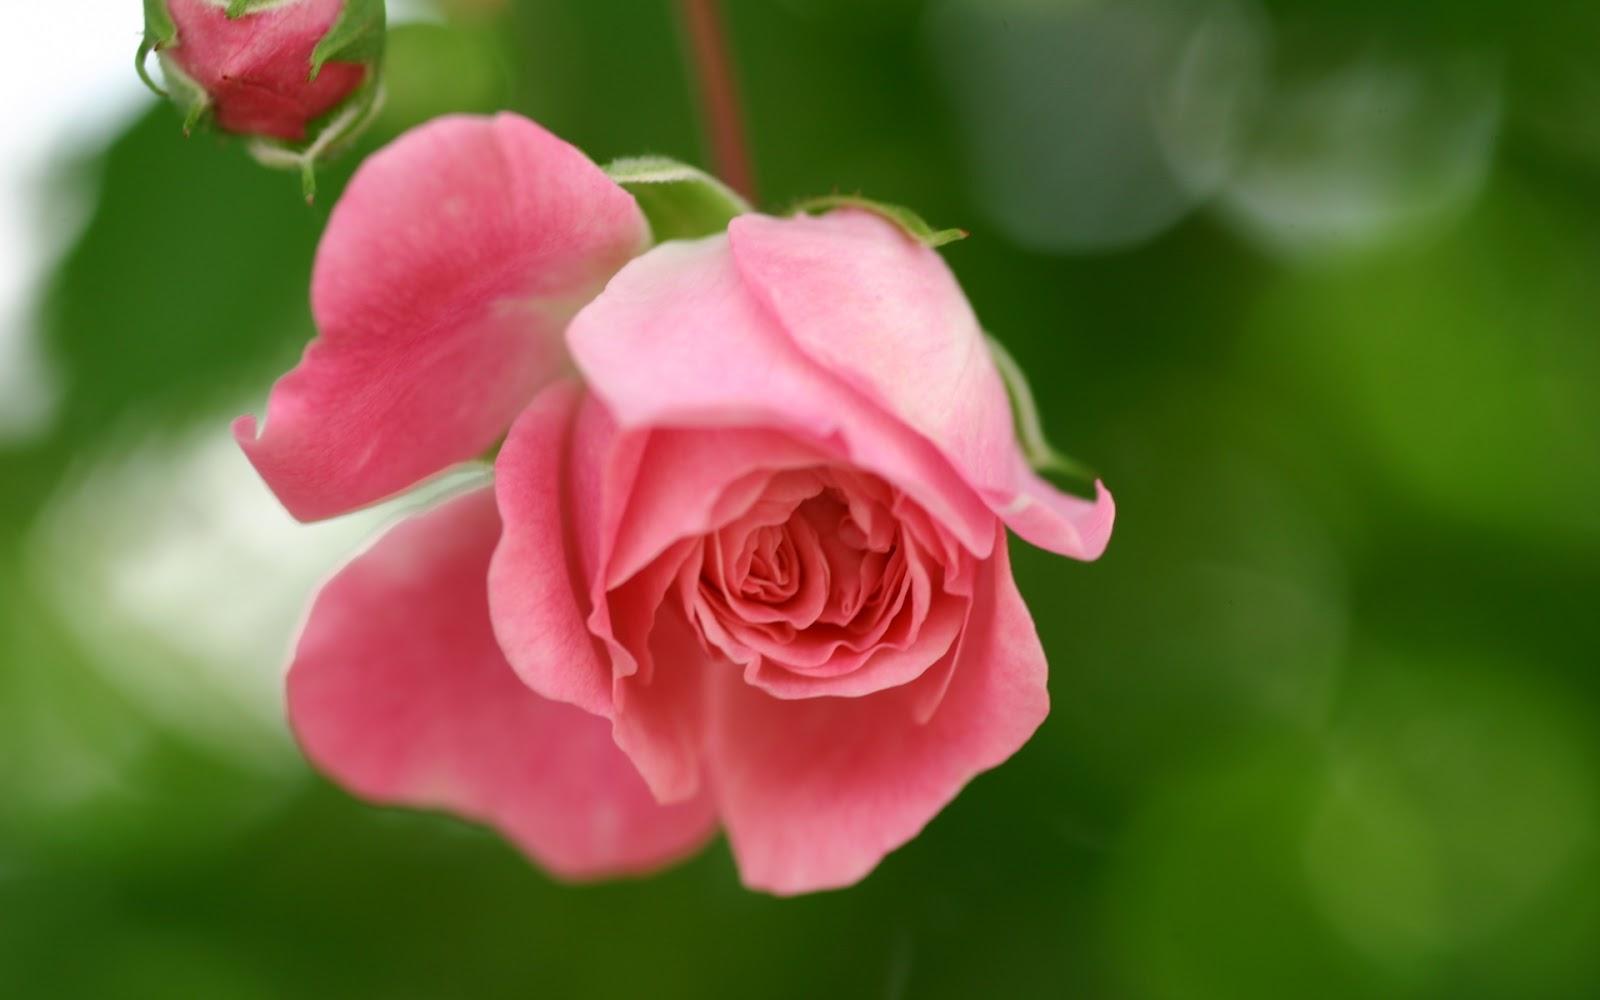 hermosas rosas rosadas con fraces de esperanza Mundo